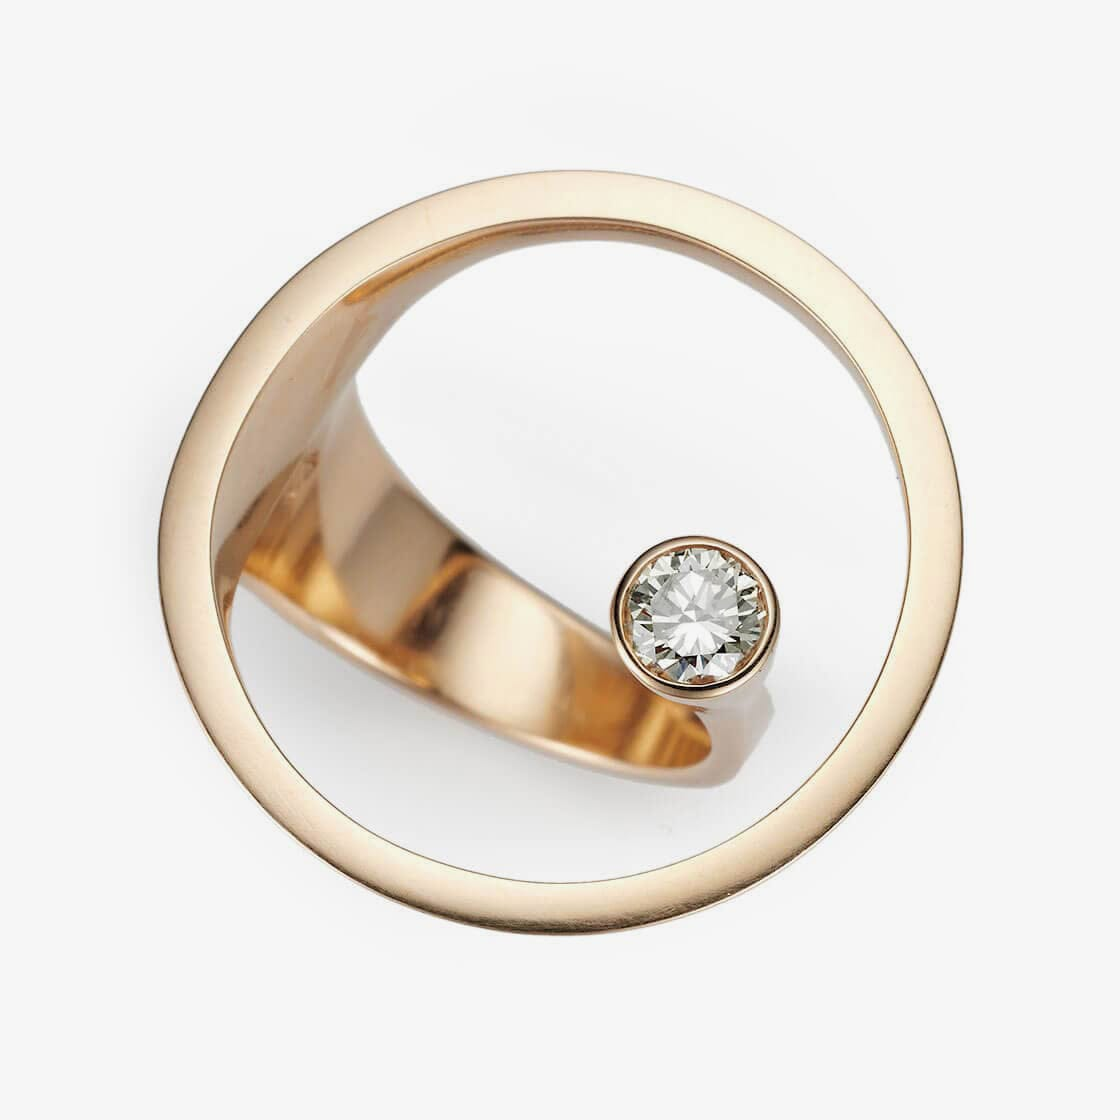 huebel-ring-schatzinsel-01